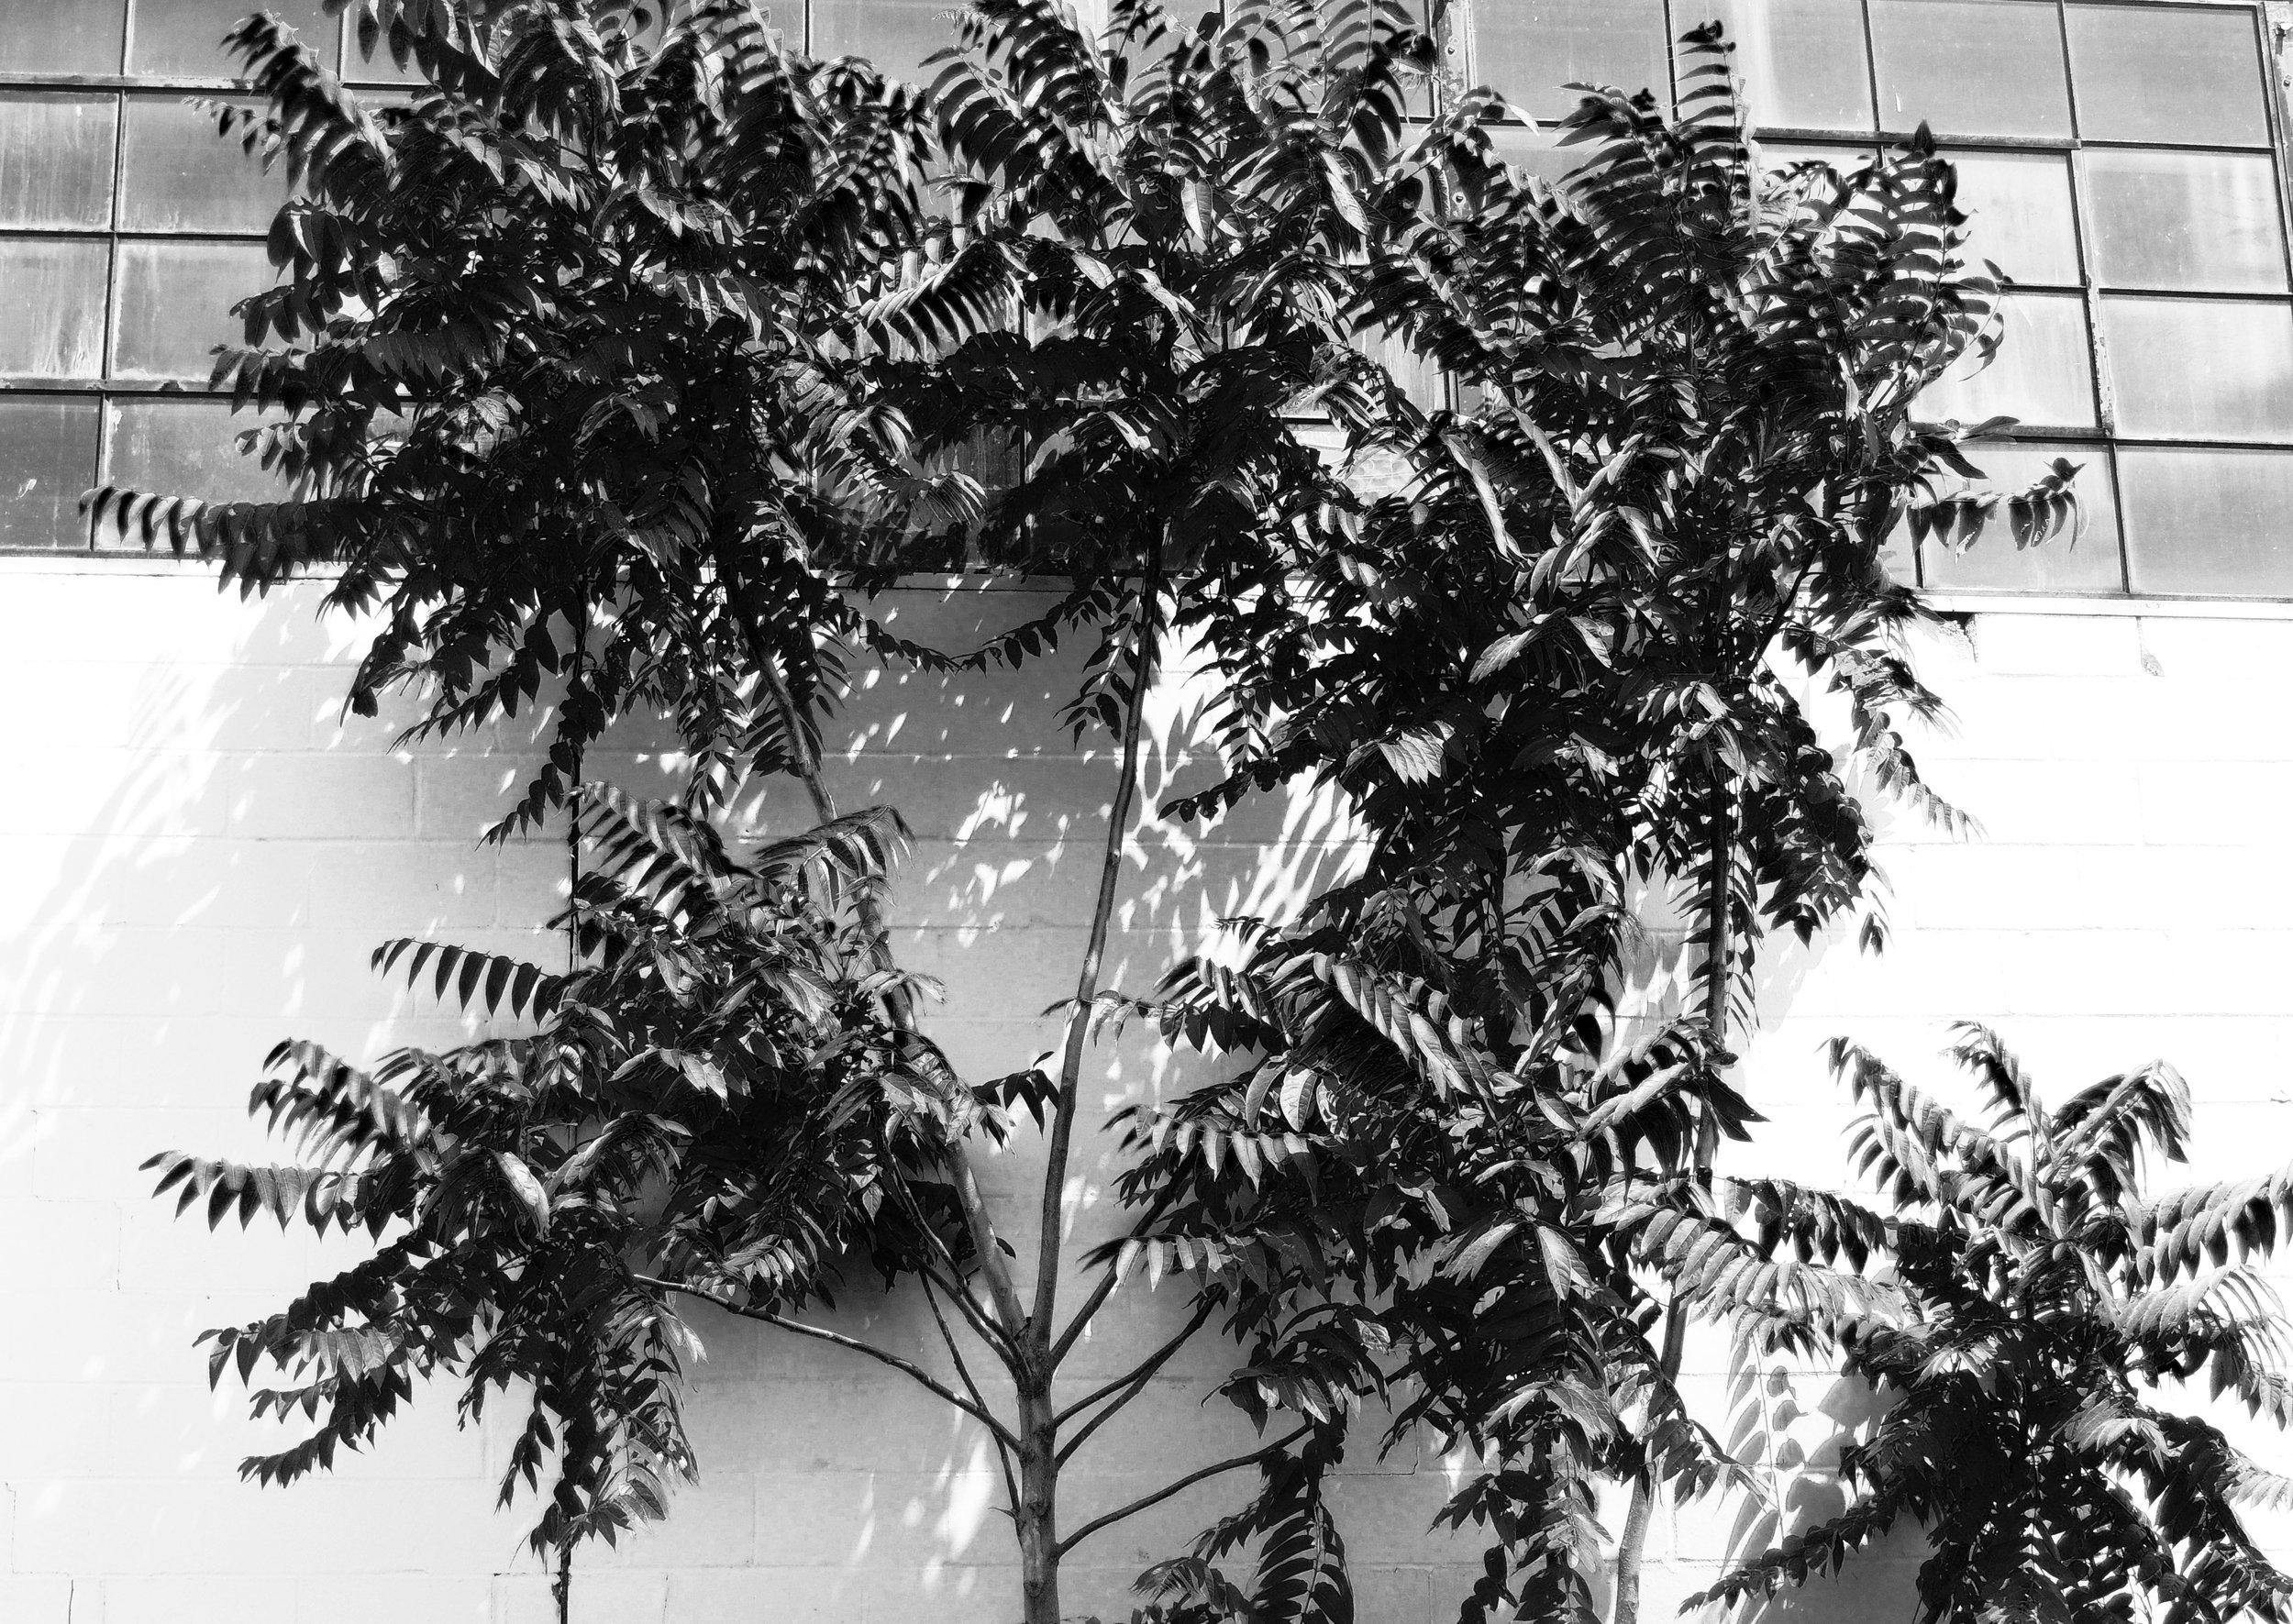 Black and White Urban Plant photograph